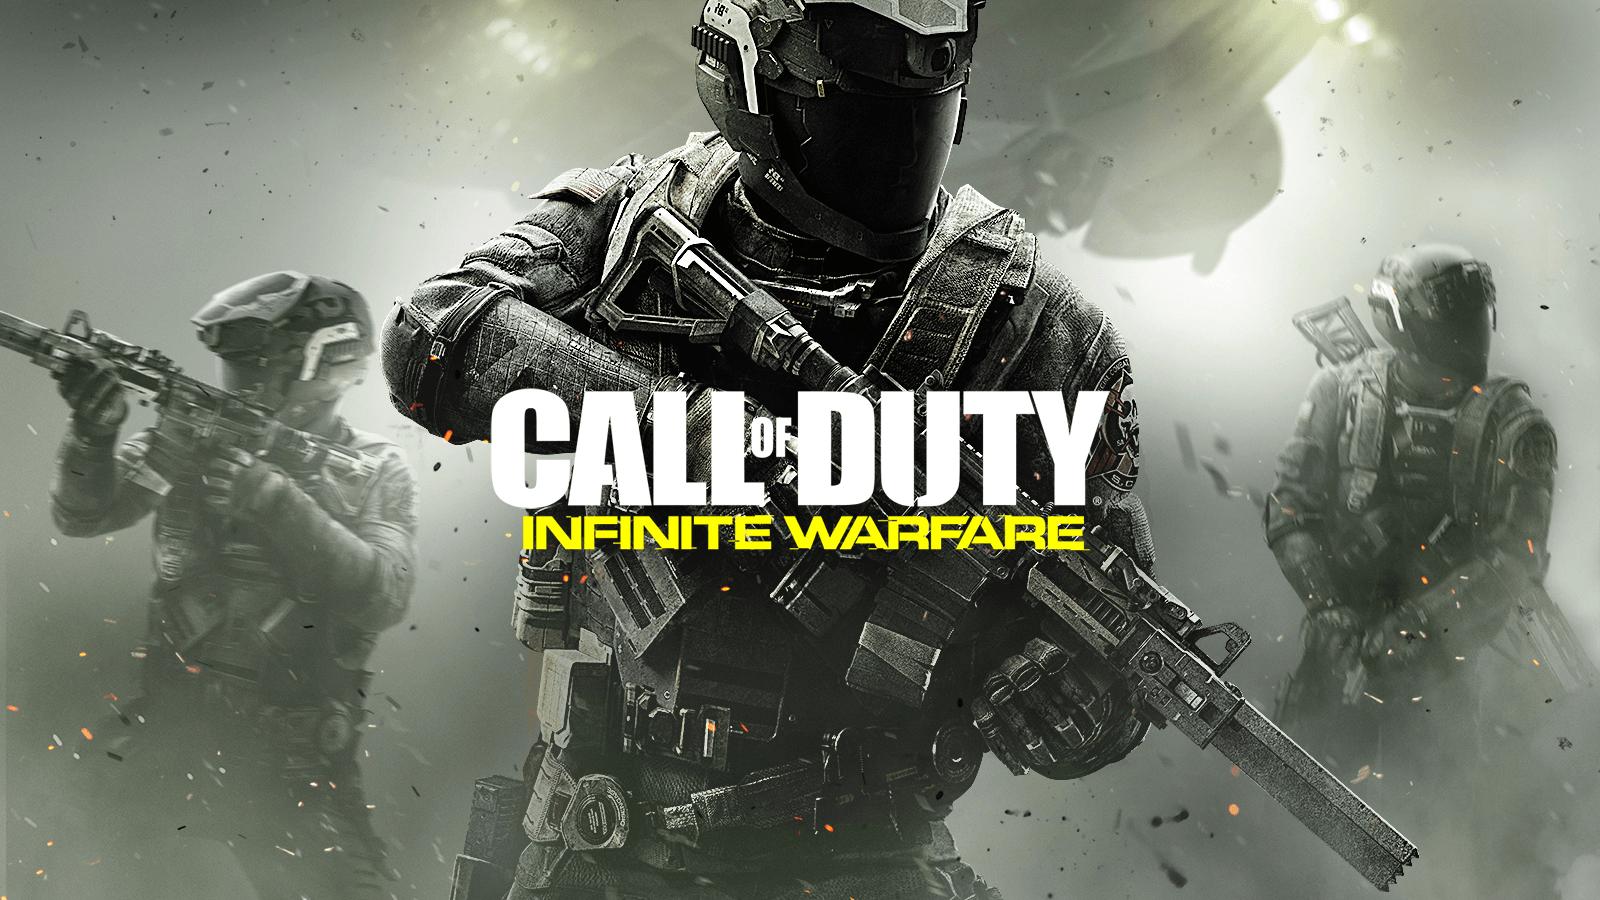 Evil Genius announced new Call of Duty Team